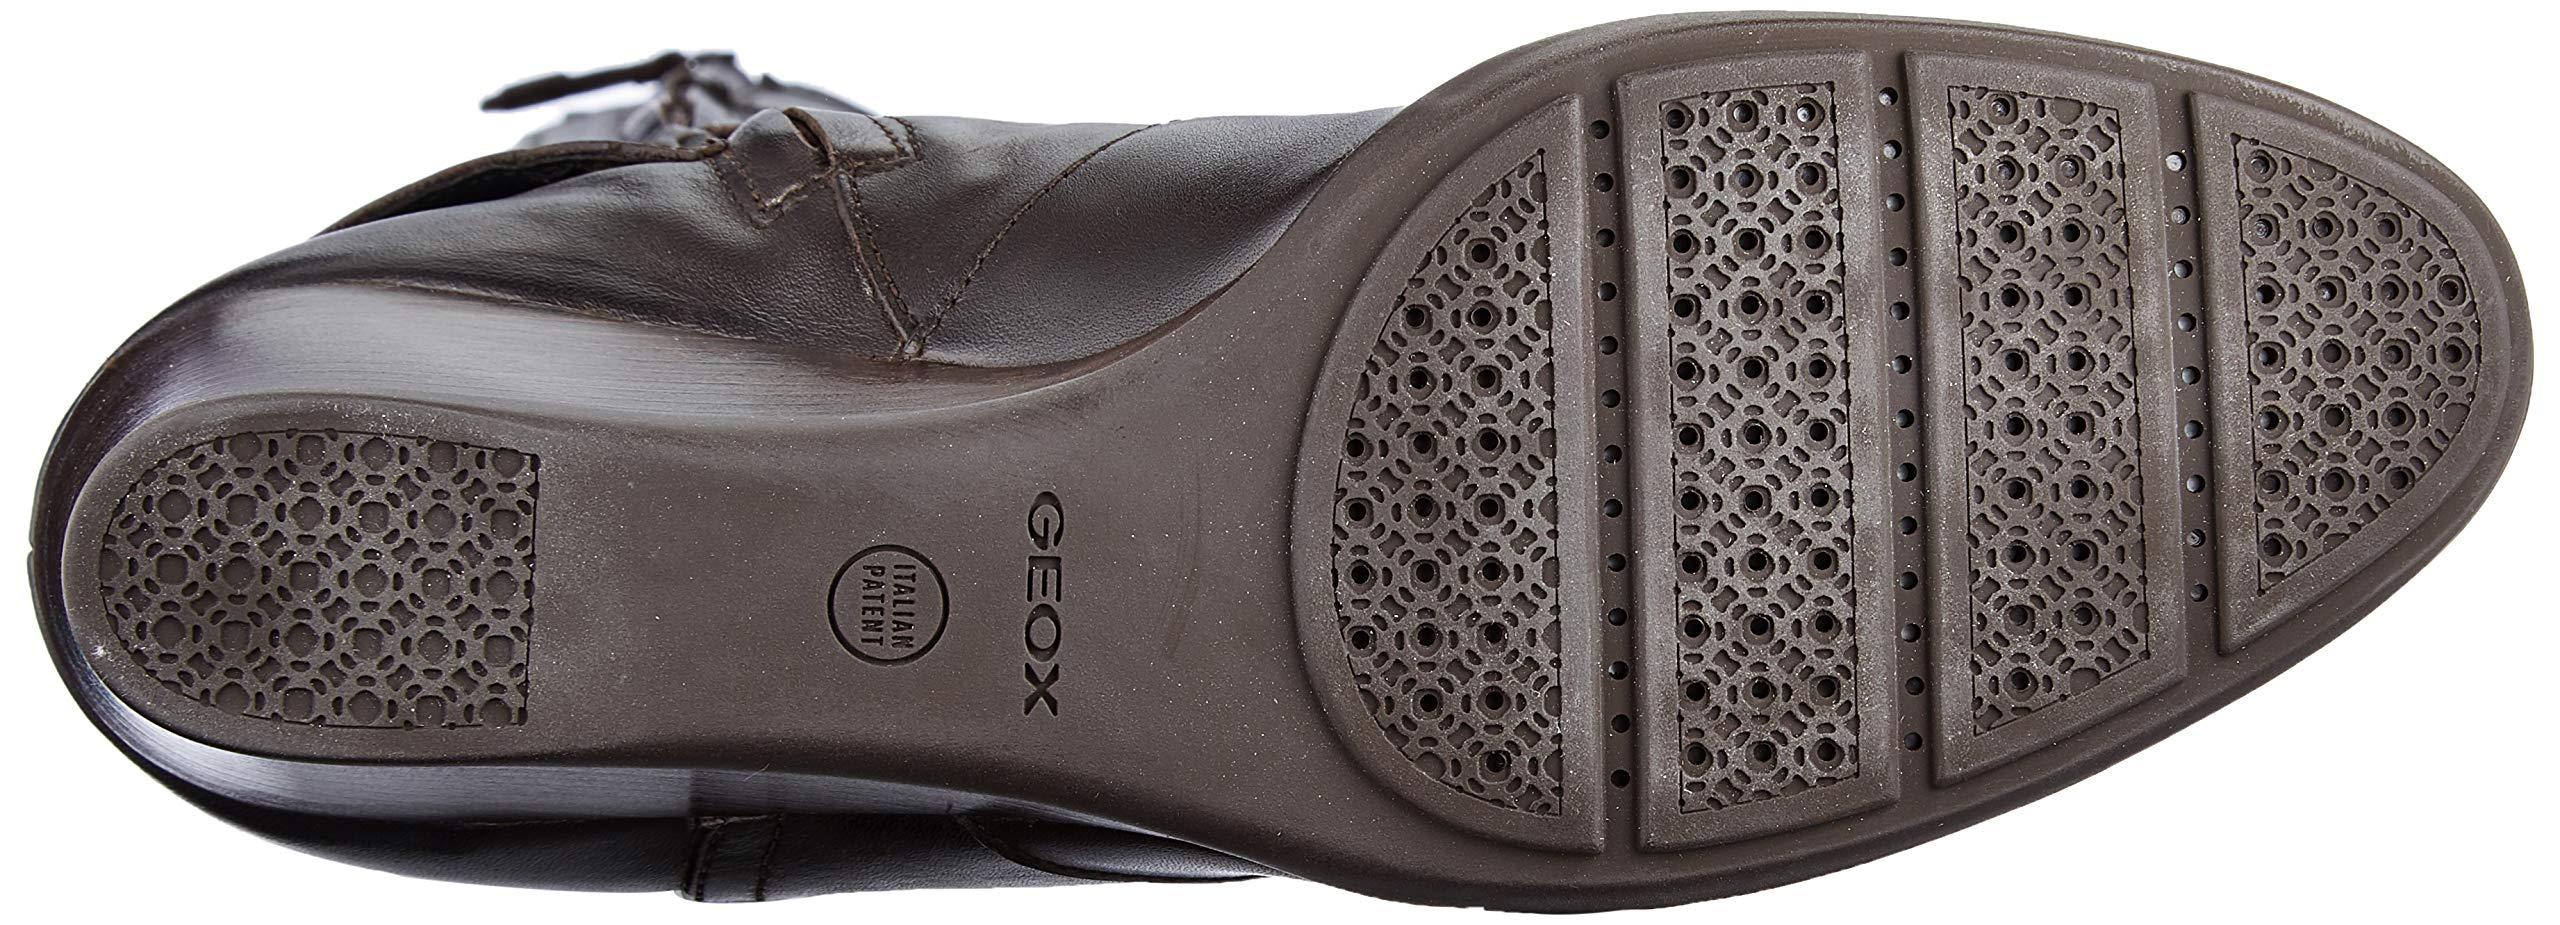 Geox Damen D Inspiration Wedge B Stiefel 3